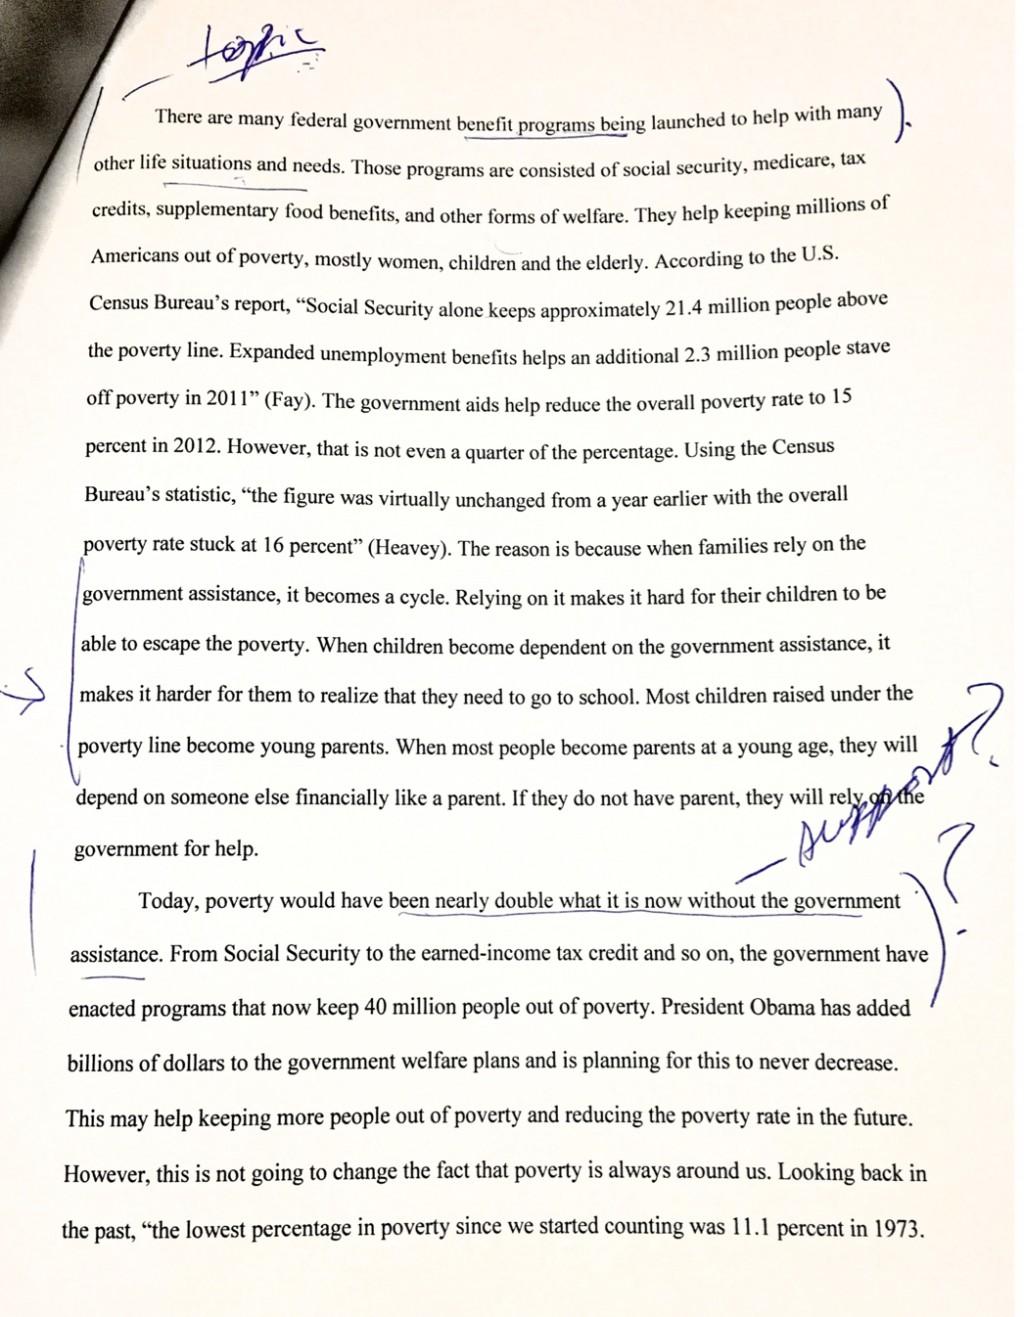 002 Rewrite Essay Best Software Article Freelance Large